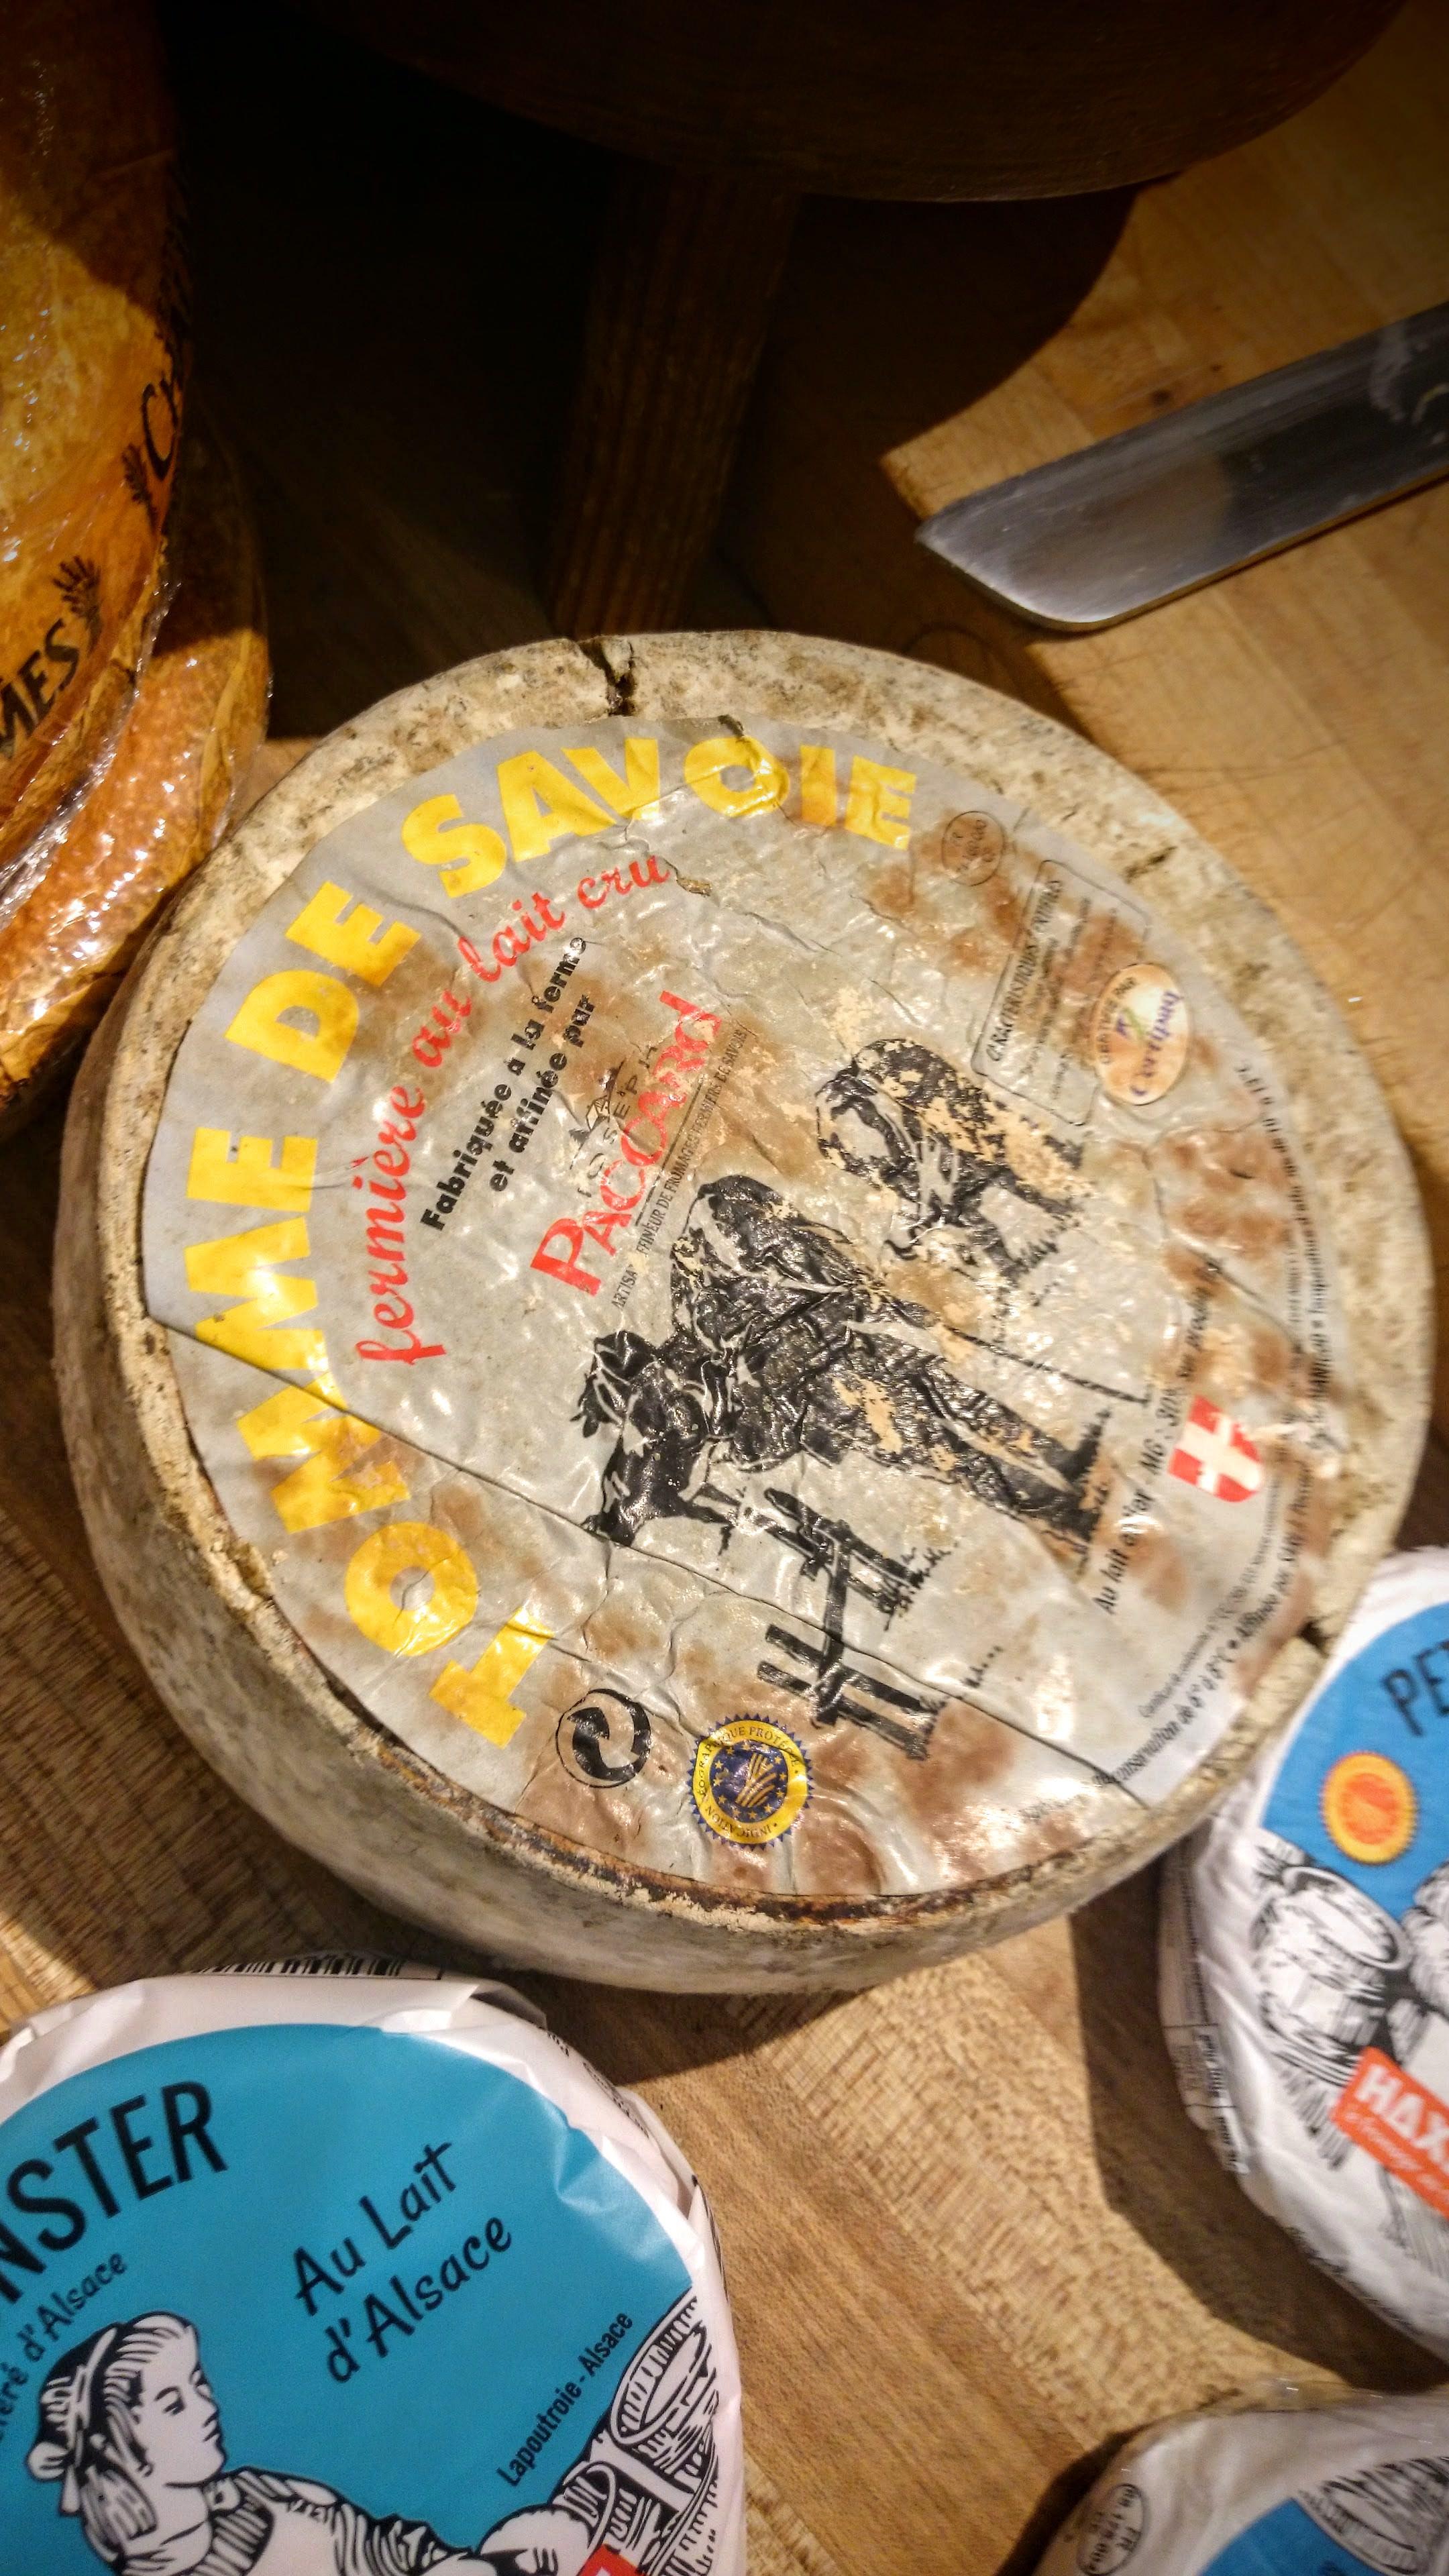 tomme-de-savoie-fermiere-cheese-store-beverly-hills.jpg